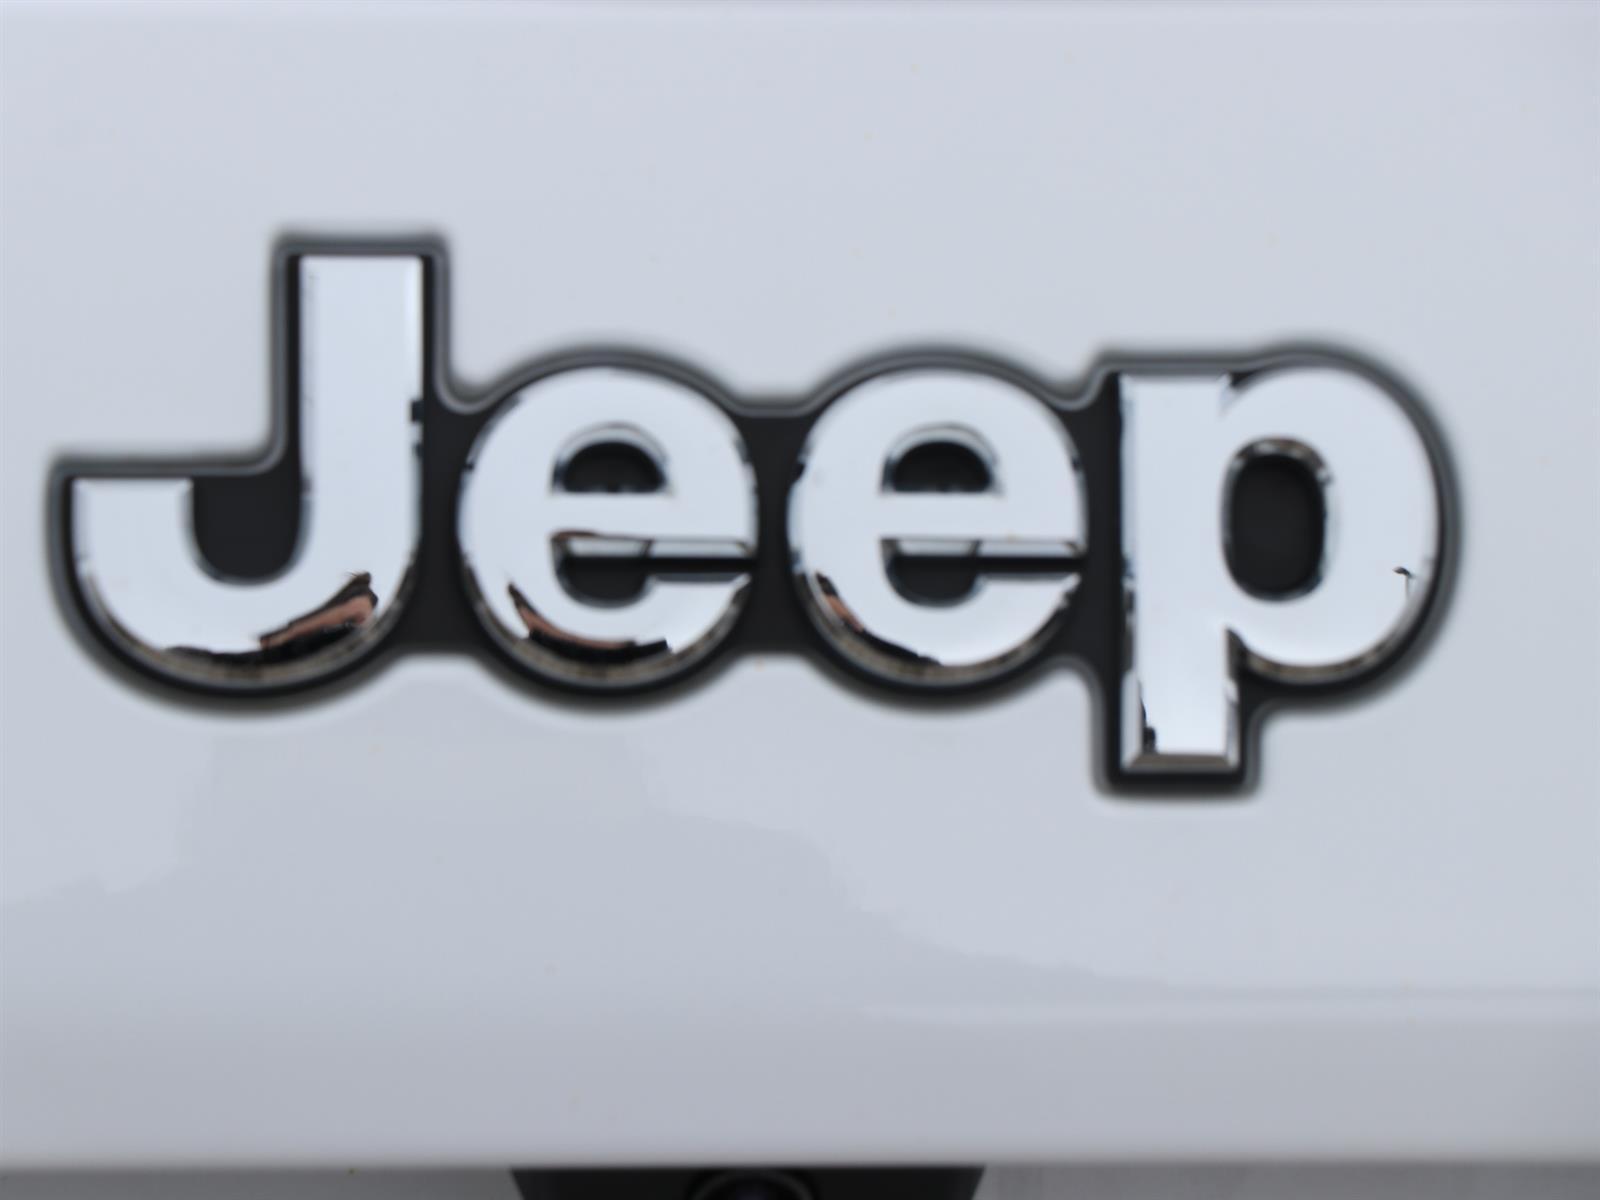 Used 2019 Jeep Cherokee in London,ON